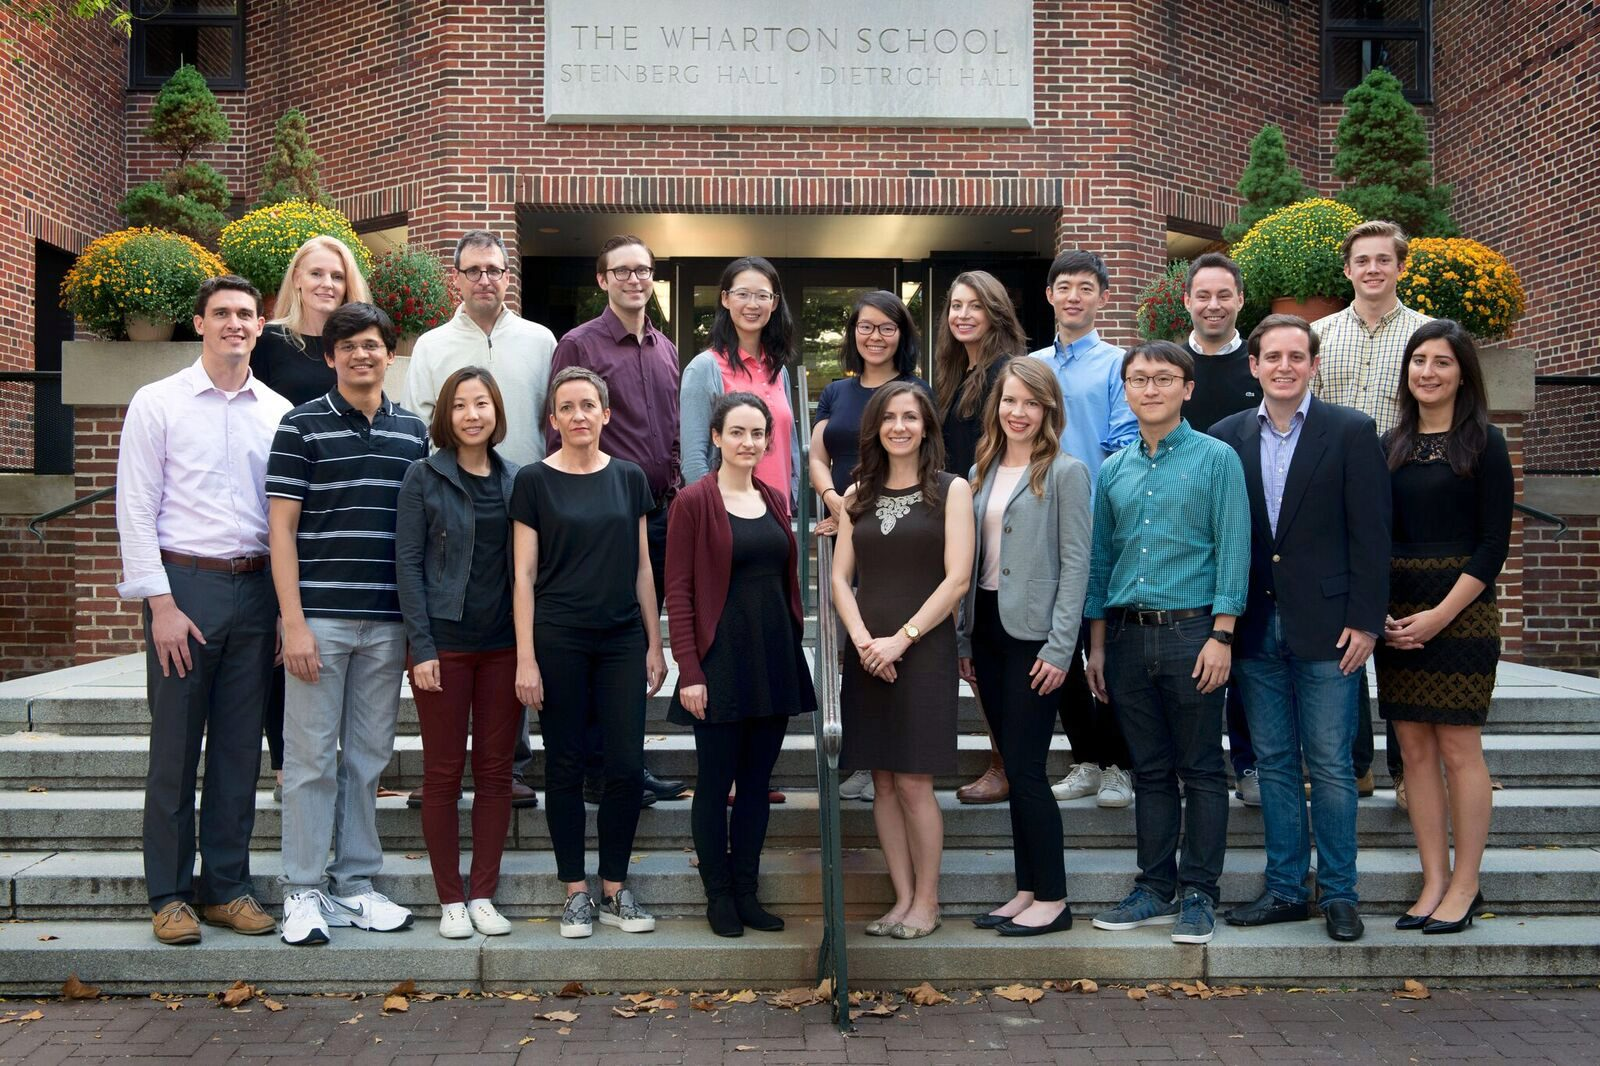 doctoral application doctoralapplication interdisciplinary studies